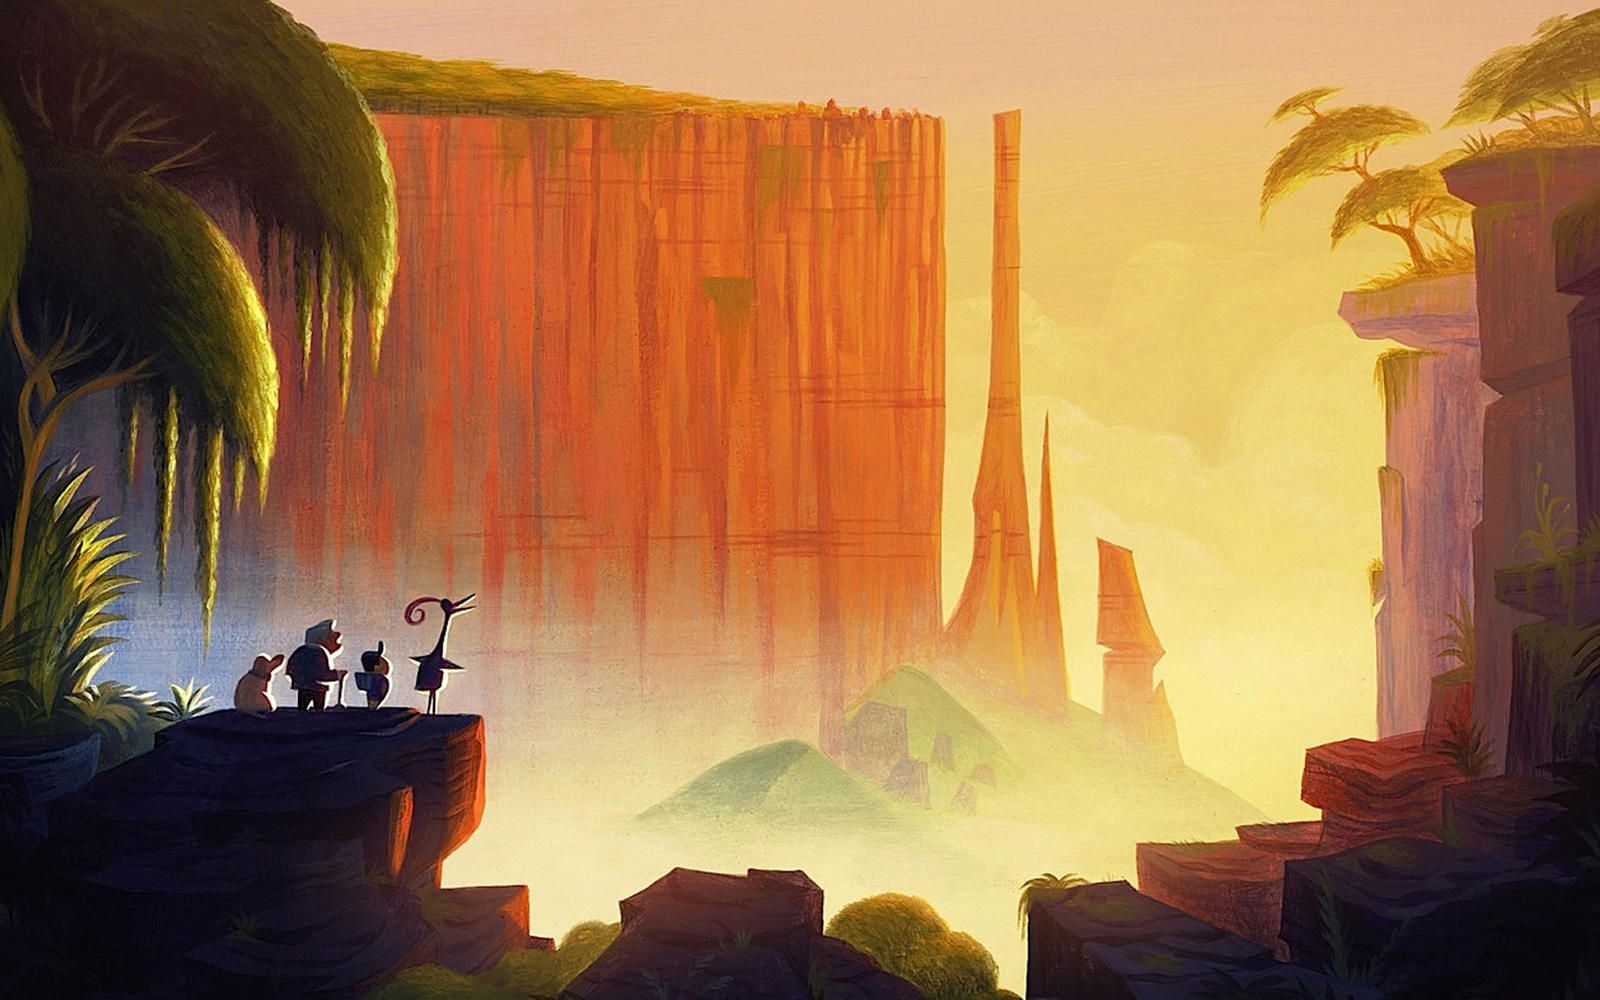 Pin By Mark Wakeham On Paysage Decor Background Environnement Pixar Concept Art Disney Concept Art Environment Concept Art